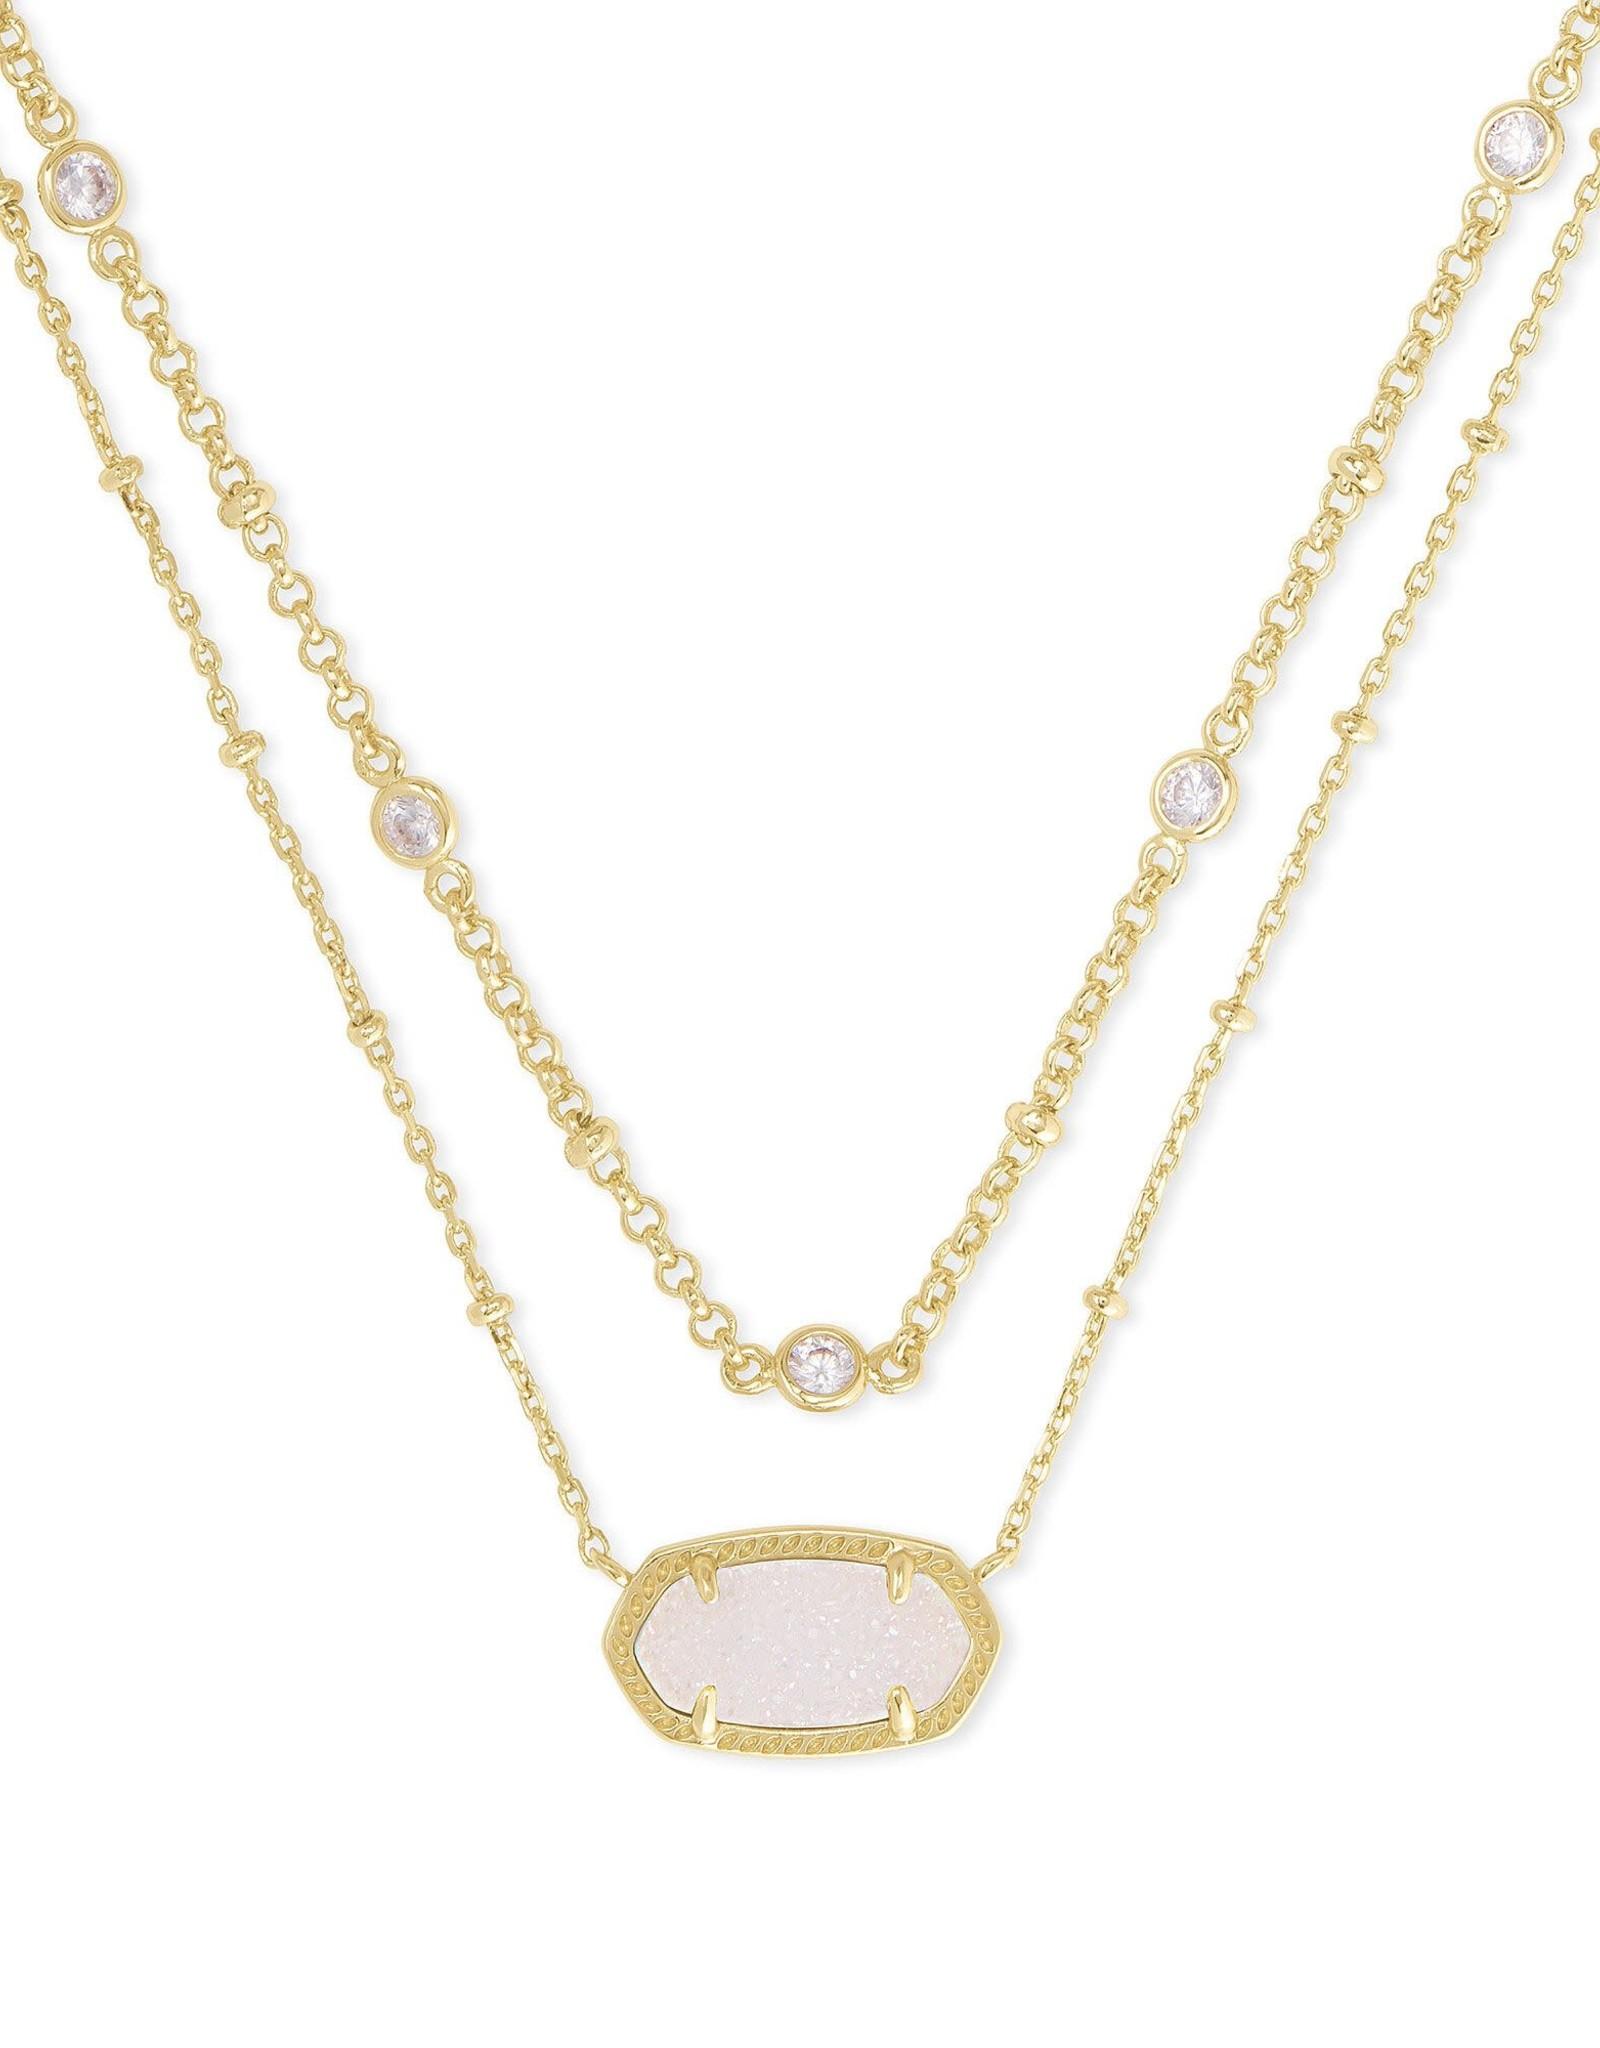 Kendra Scott Elisa Multi Strand Necklace - Irridescent Drusy/Gold